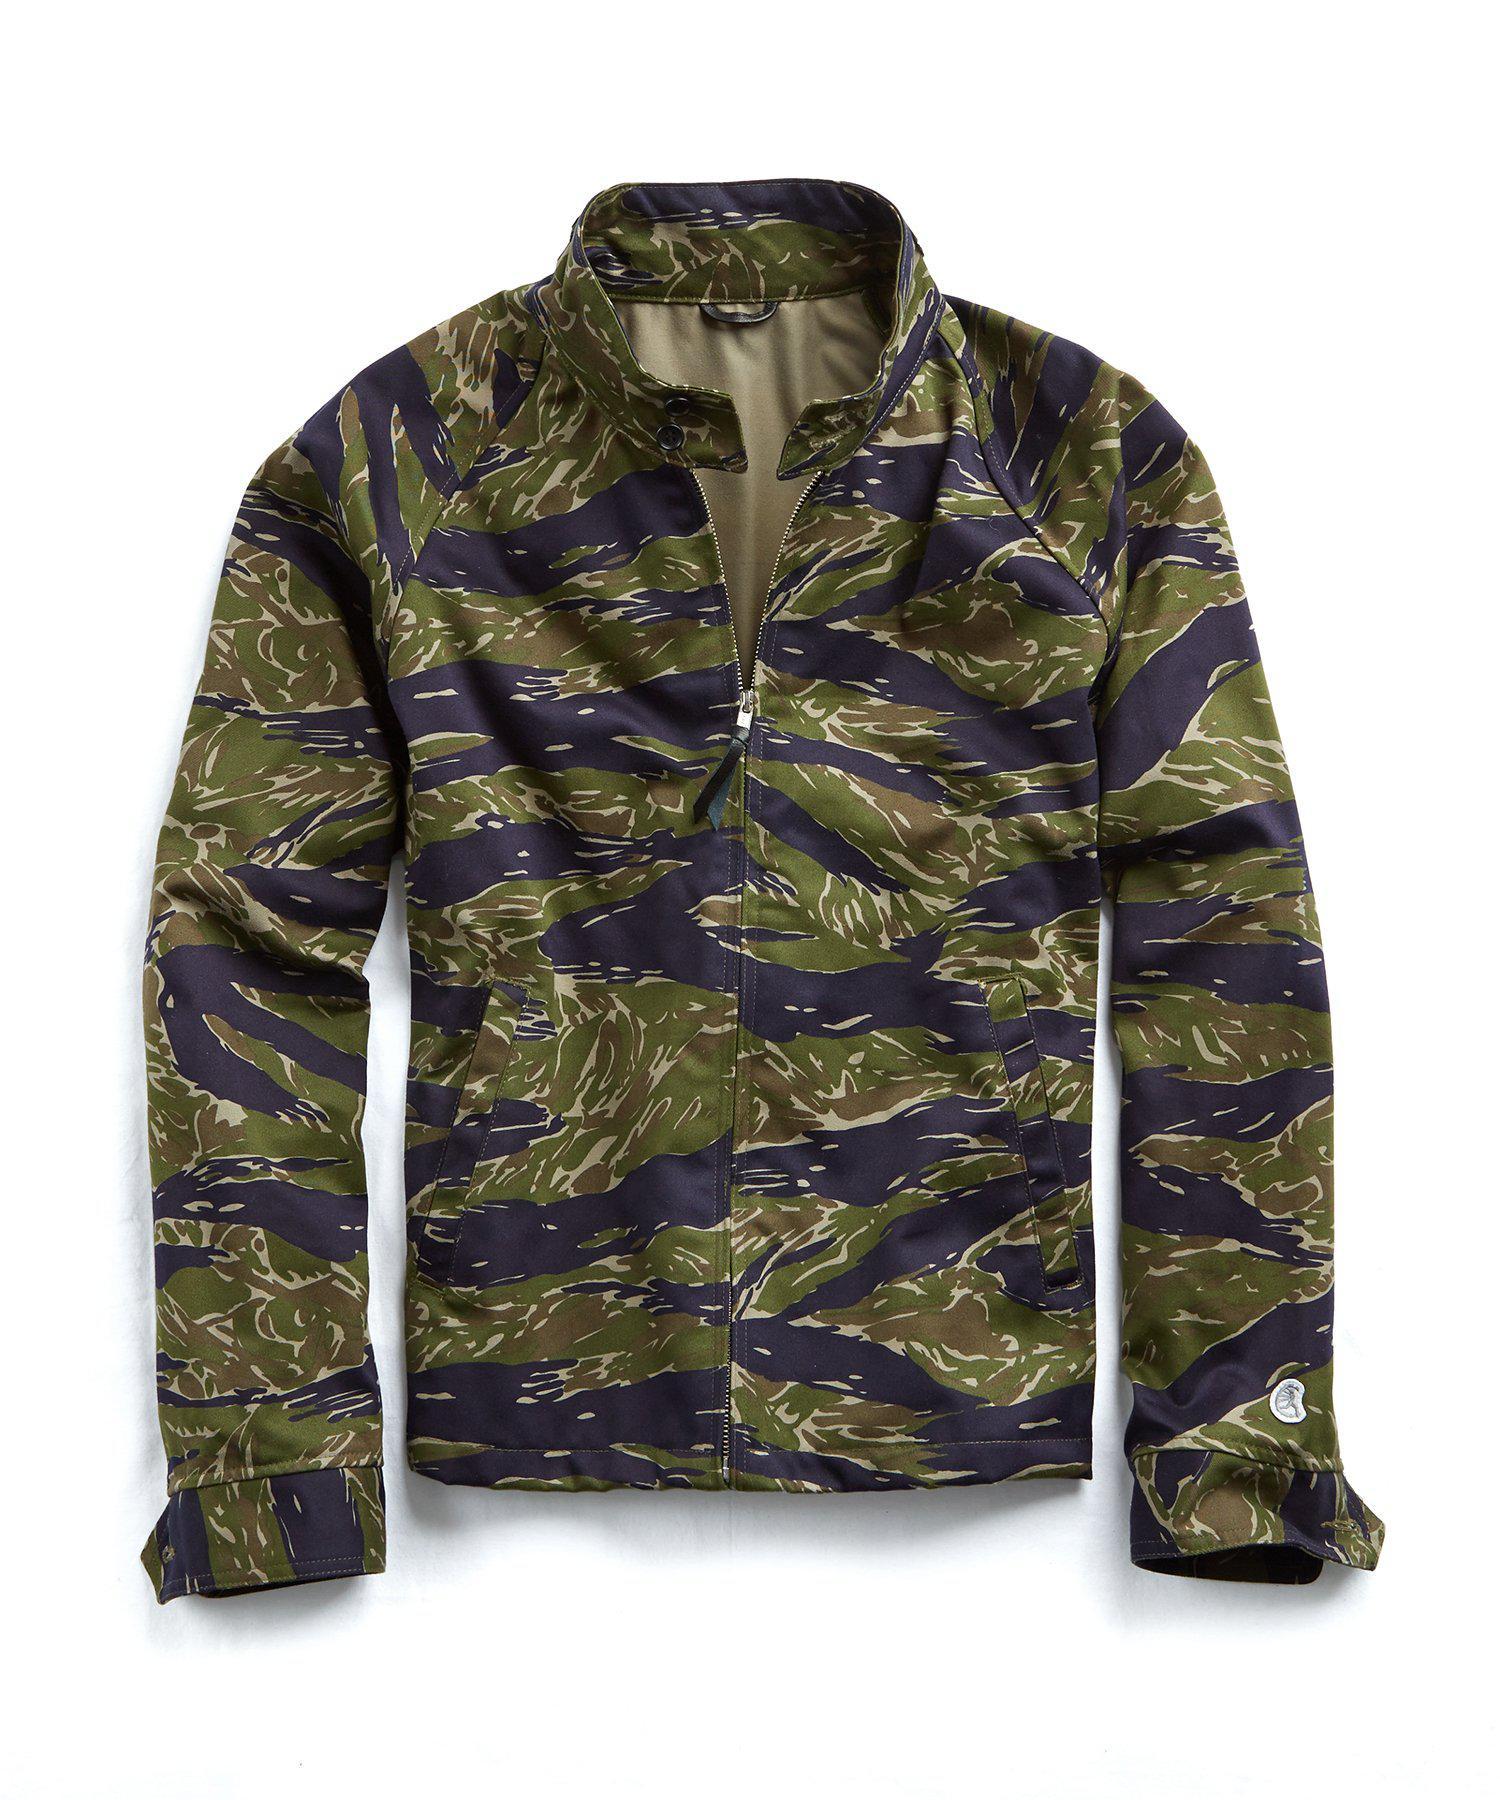 781d751051706 Todd Snyder Tiger Camo Harrington Jacket in Green for Men - Lyst